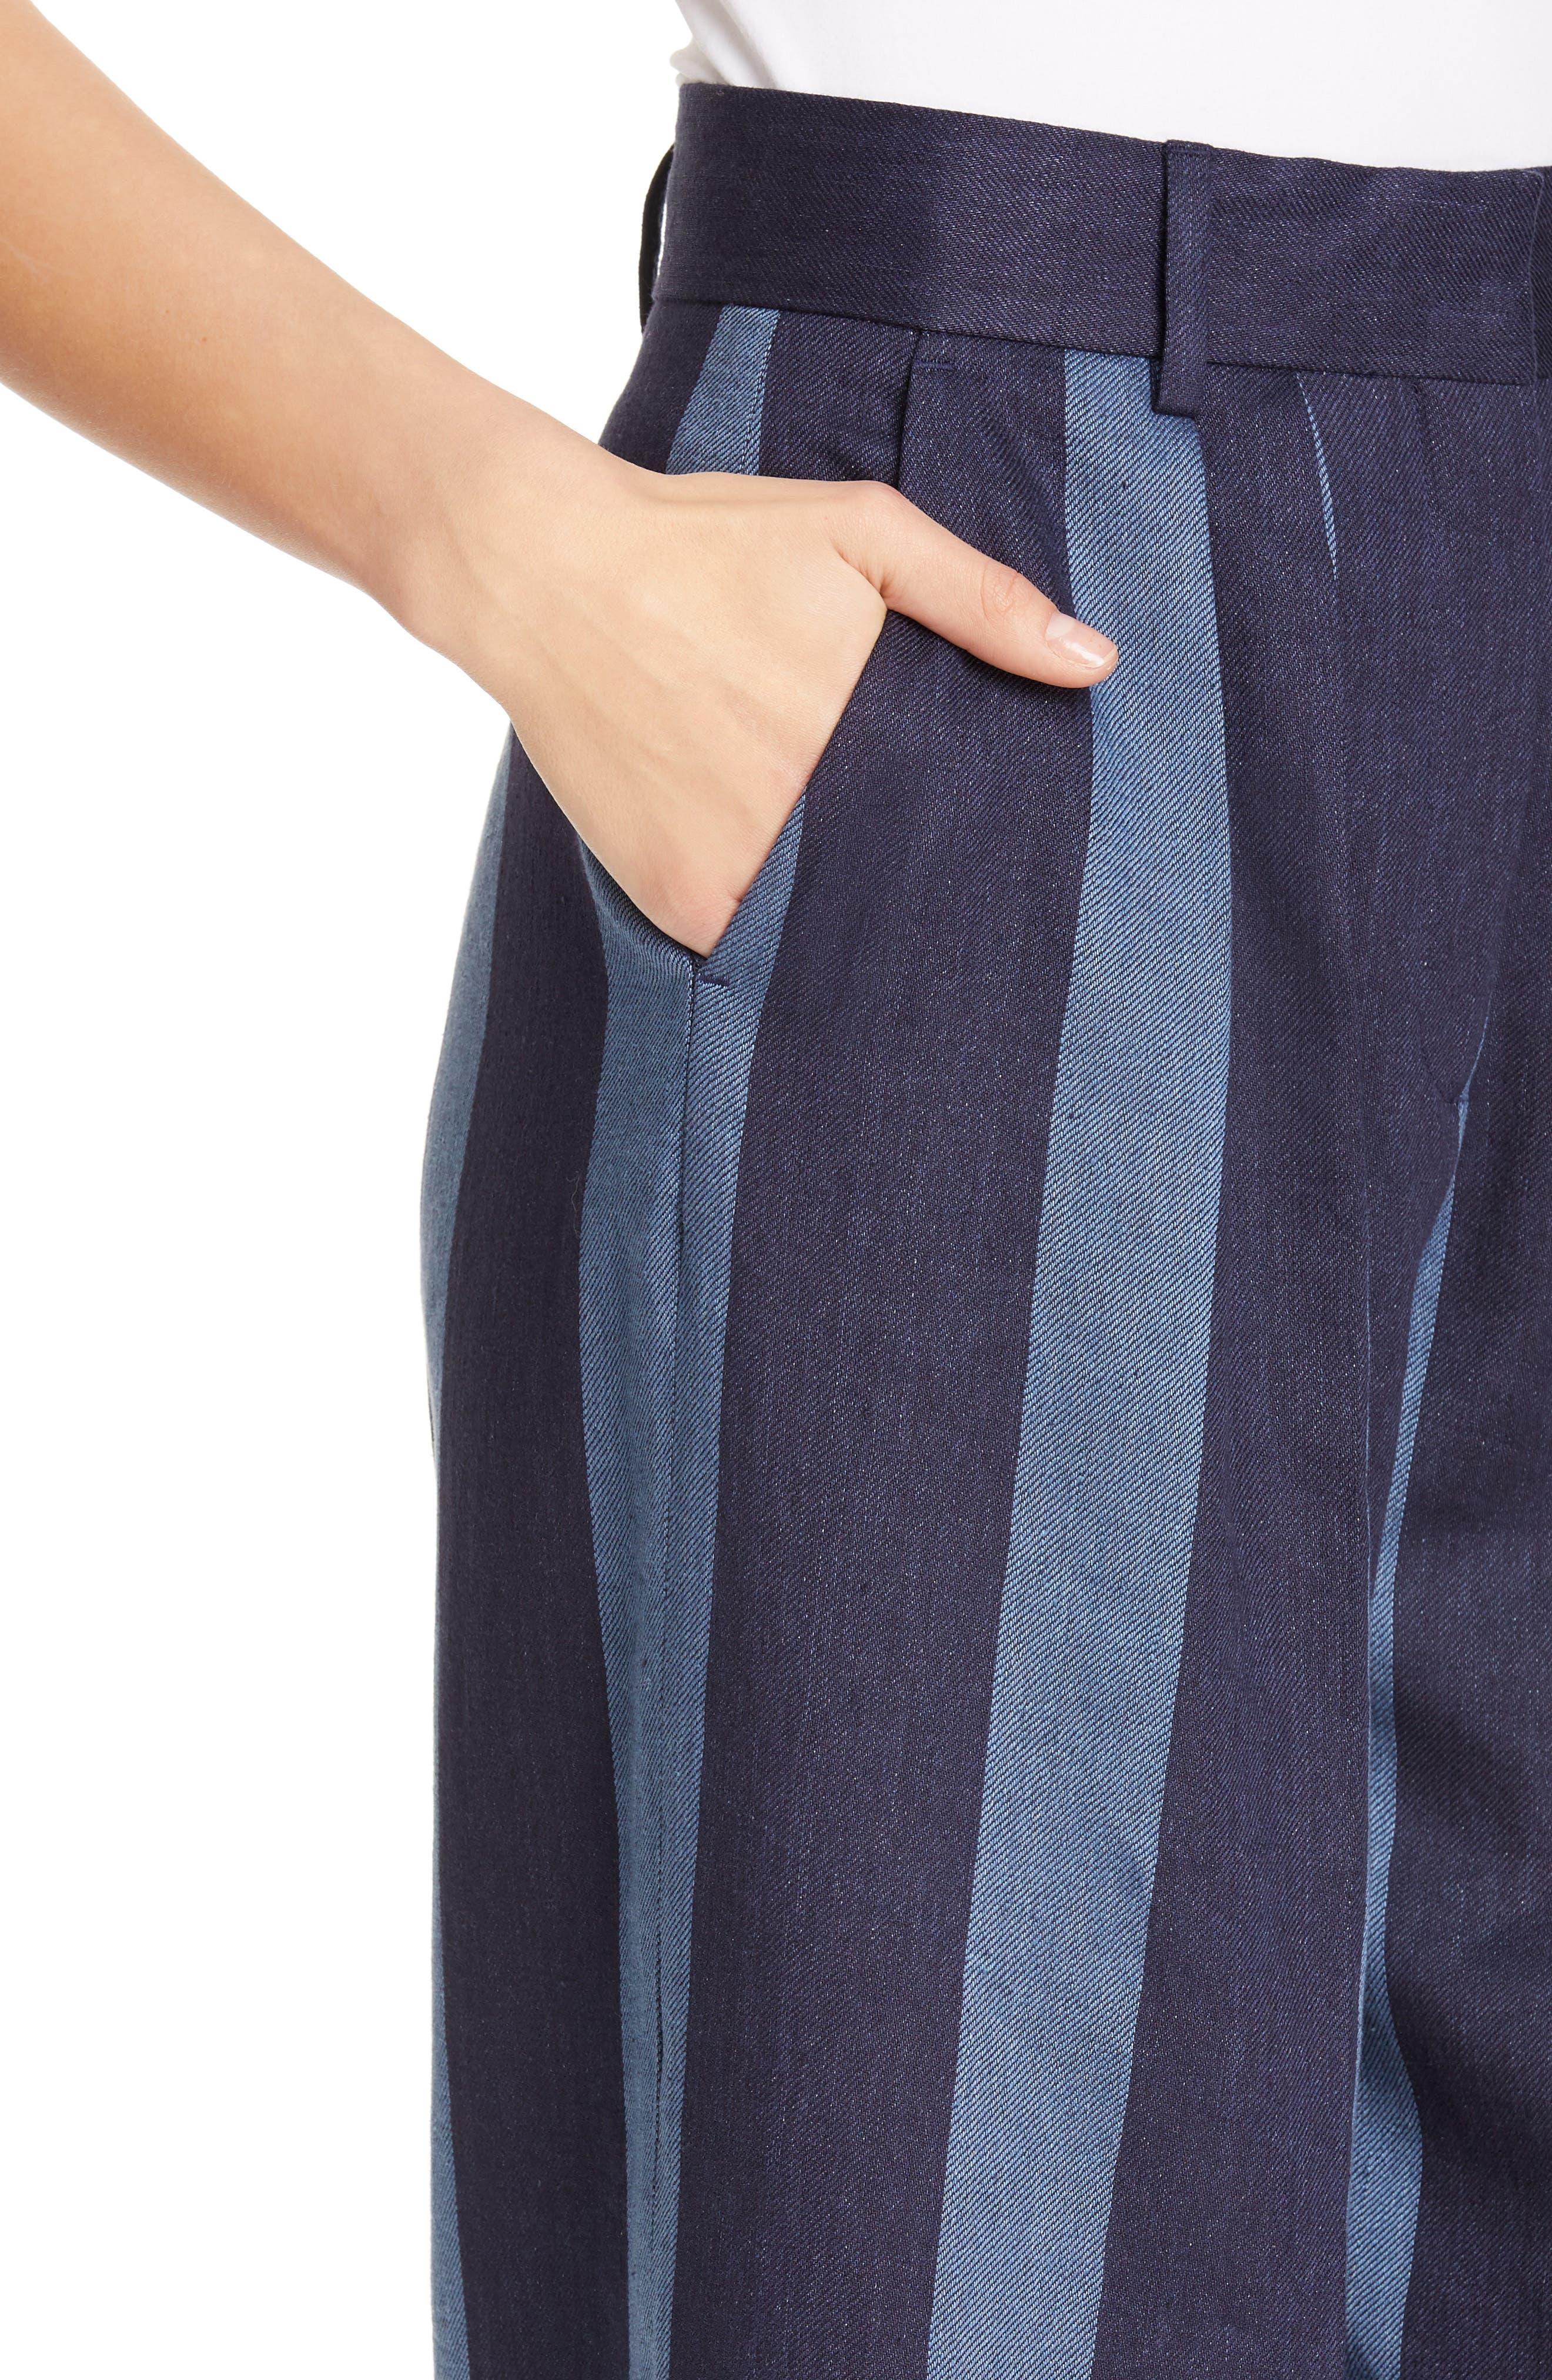 TOMMY X ZENDAYA, Stripe Denim Pants, Alternate thumbnail 5, color, STRIPED DENIM